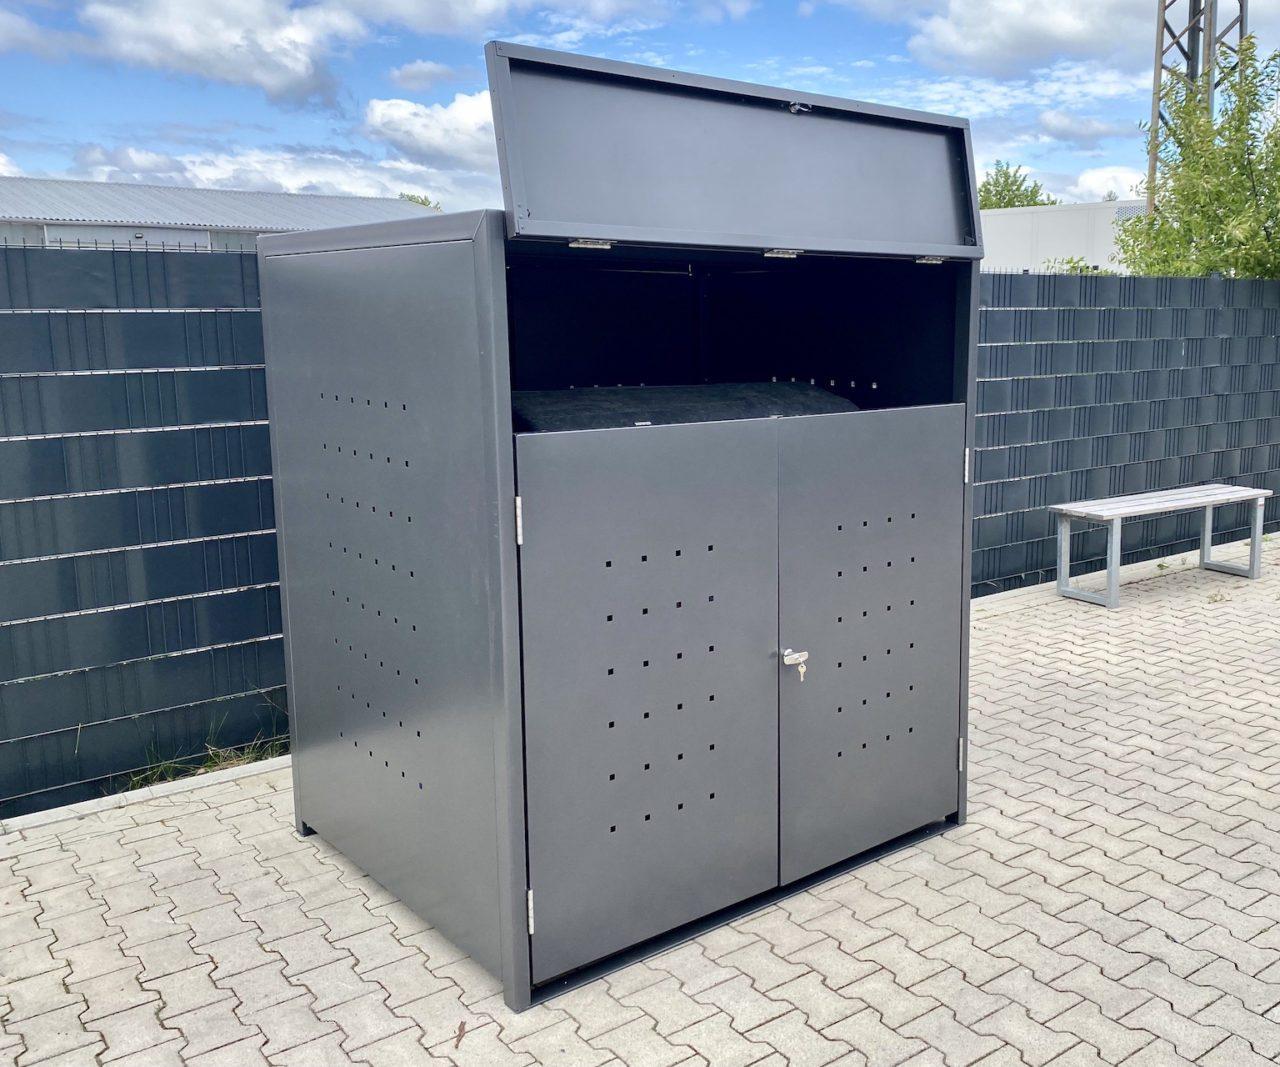 1er Müllcontainerbox Quadratlochung mit offener Klappe